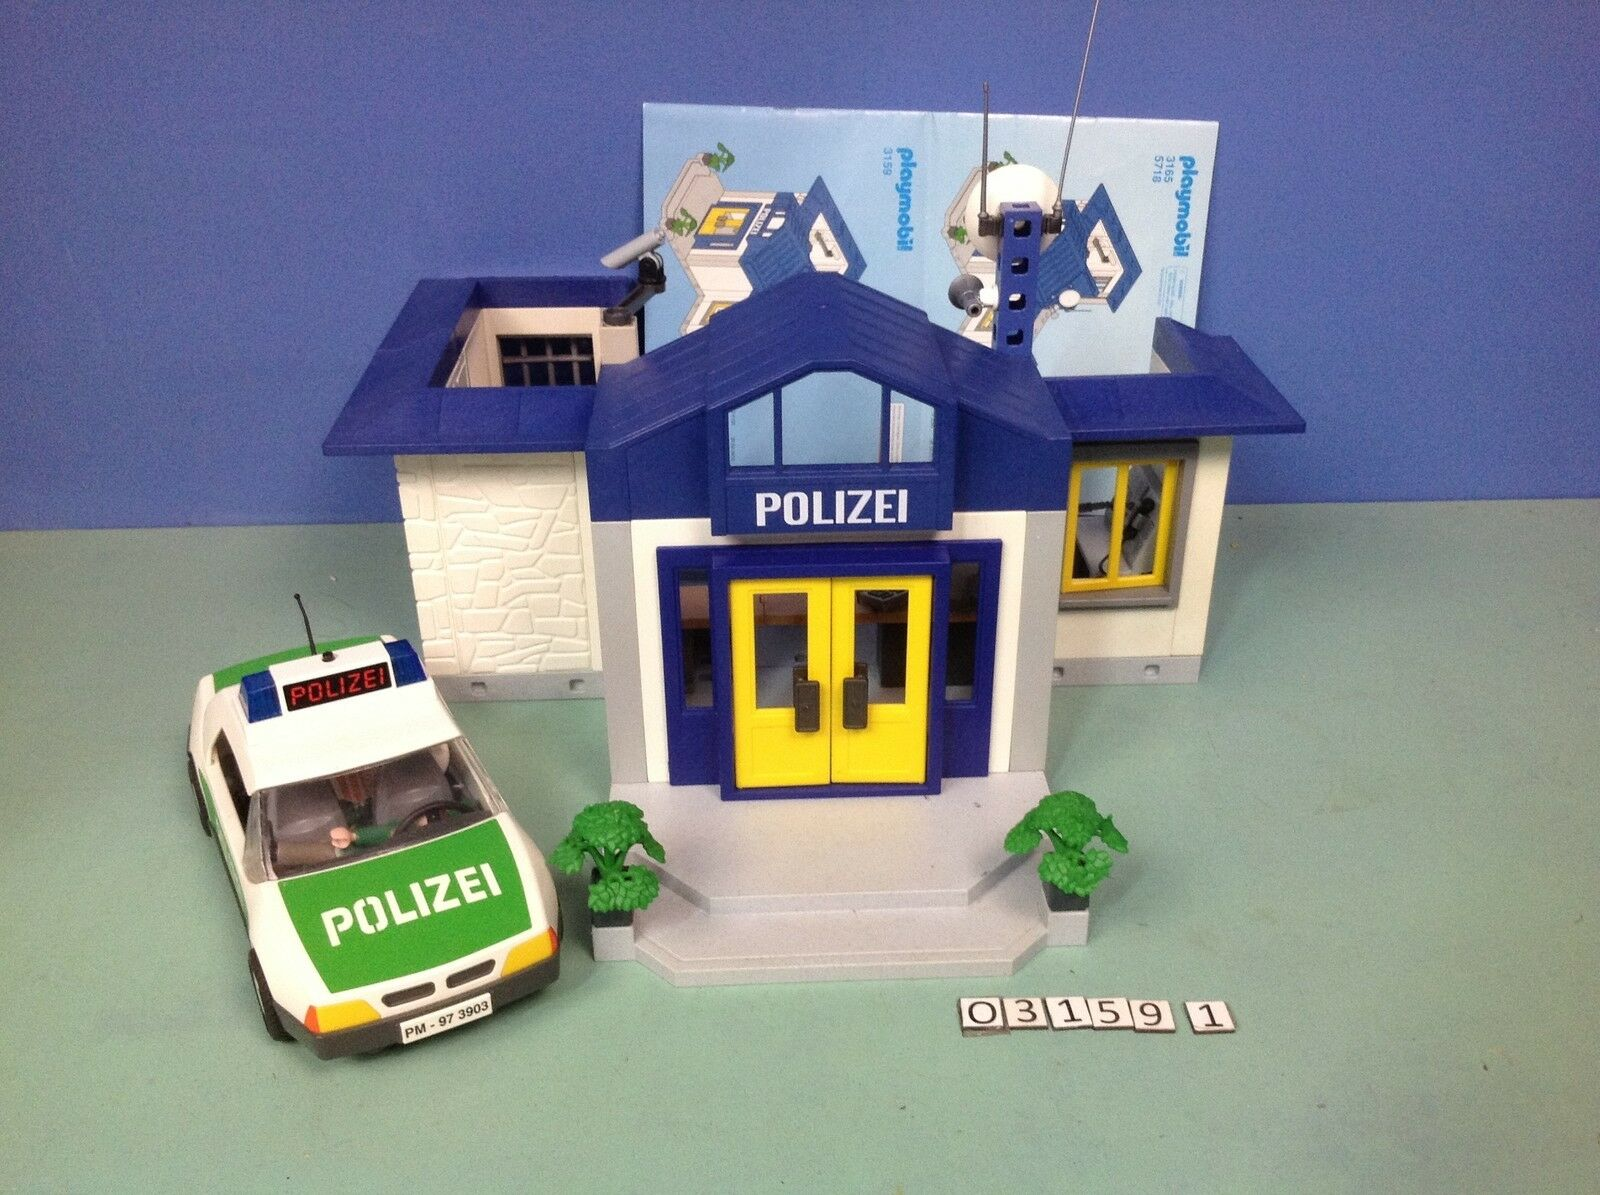 (O3159.1) Playmobil Estación  polizia (Policía) + Coche Ref 3159 3903  protezione post-vendita